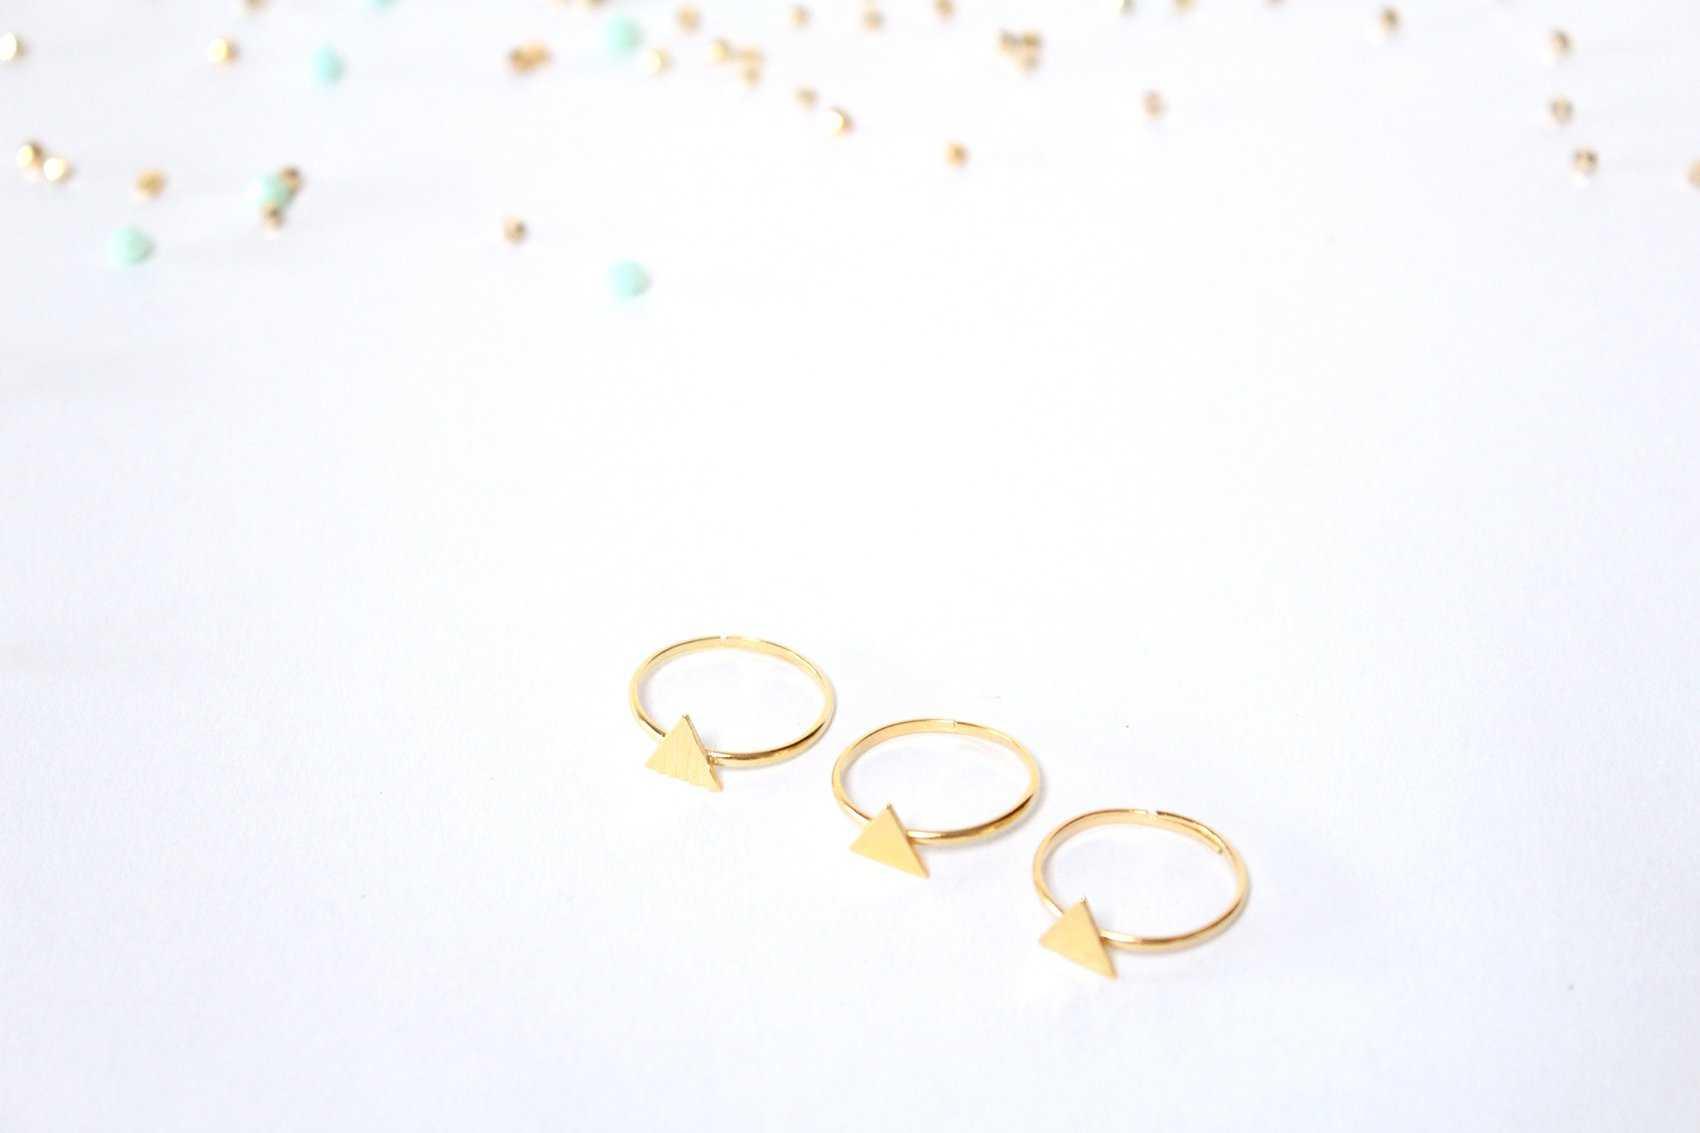 Mountain Anillos / Rings